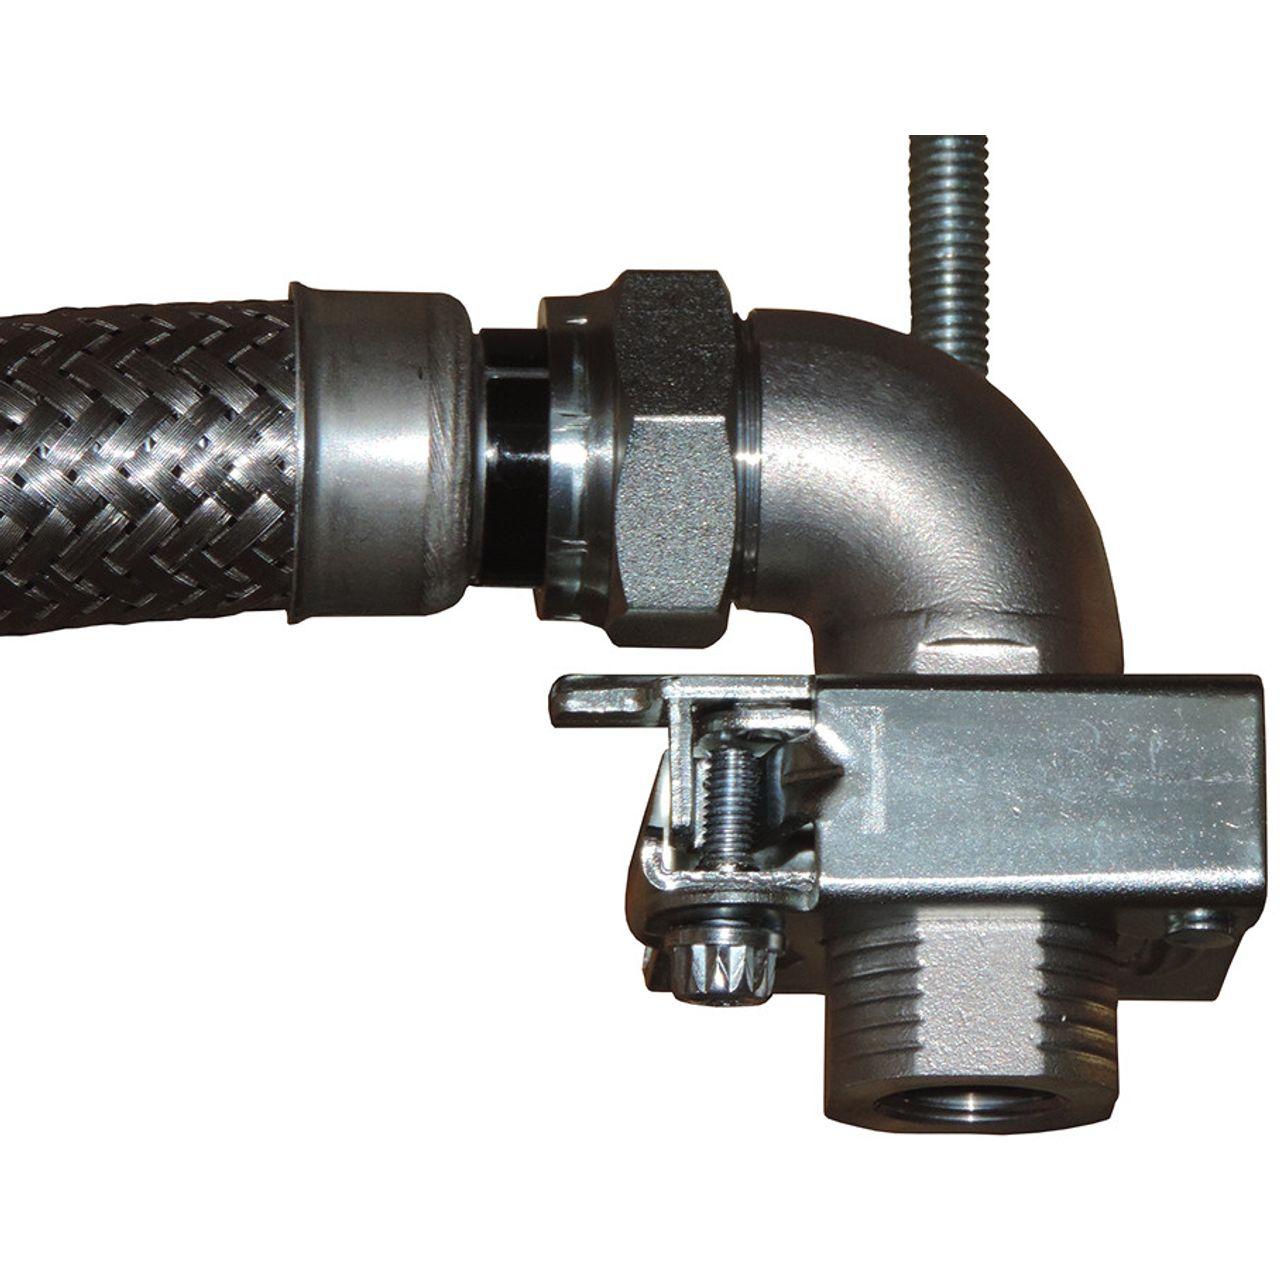 Flexible fire sprinkler fitting systems